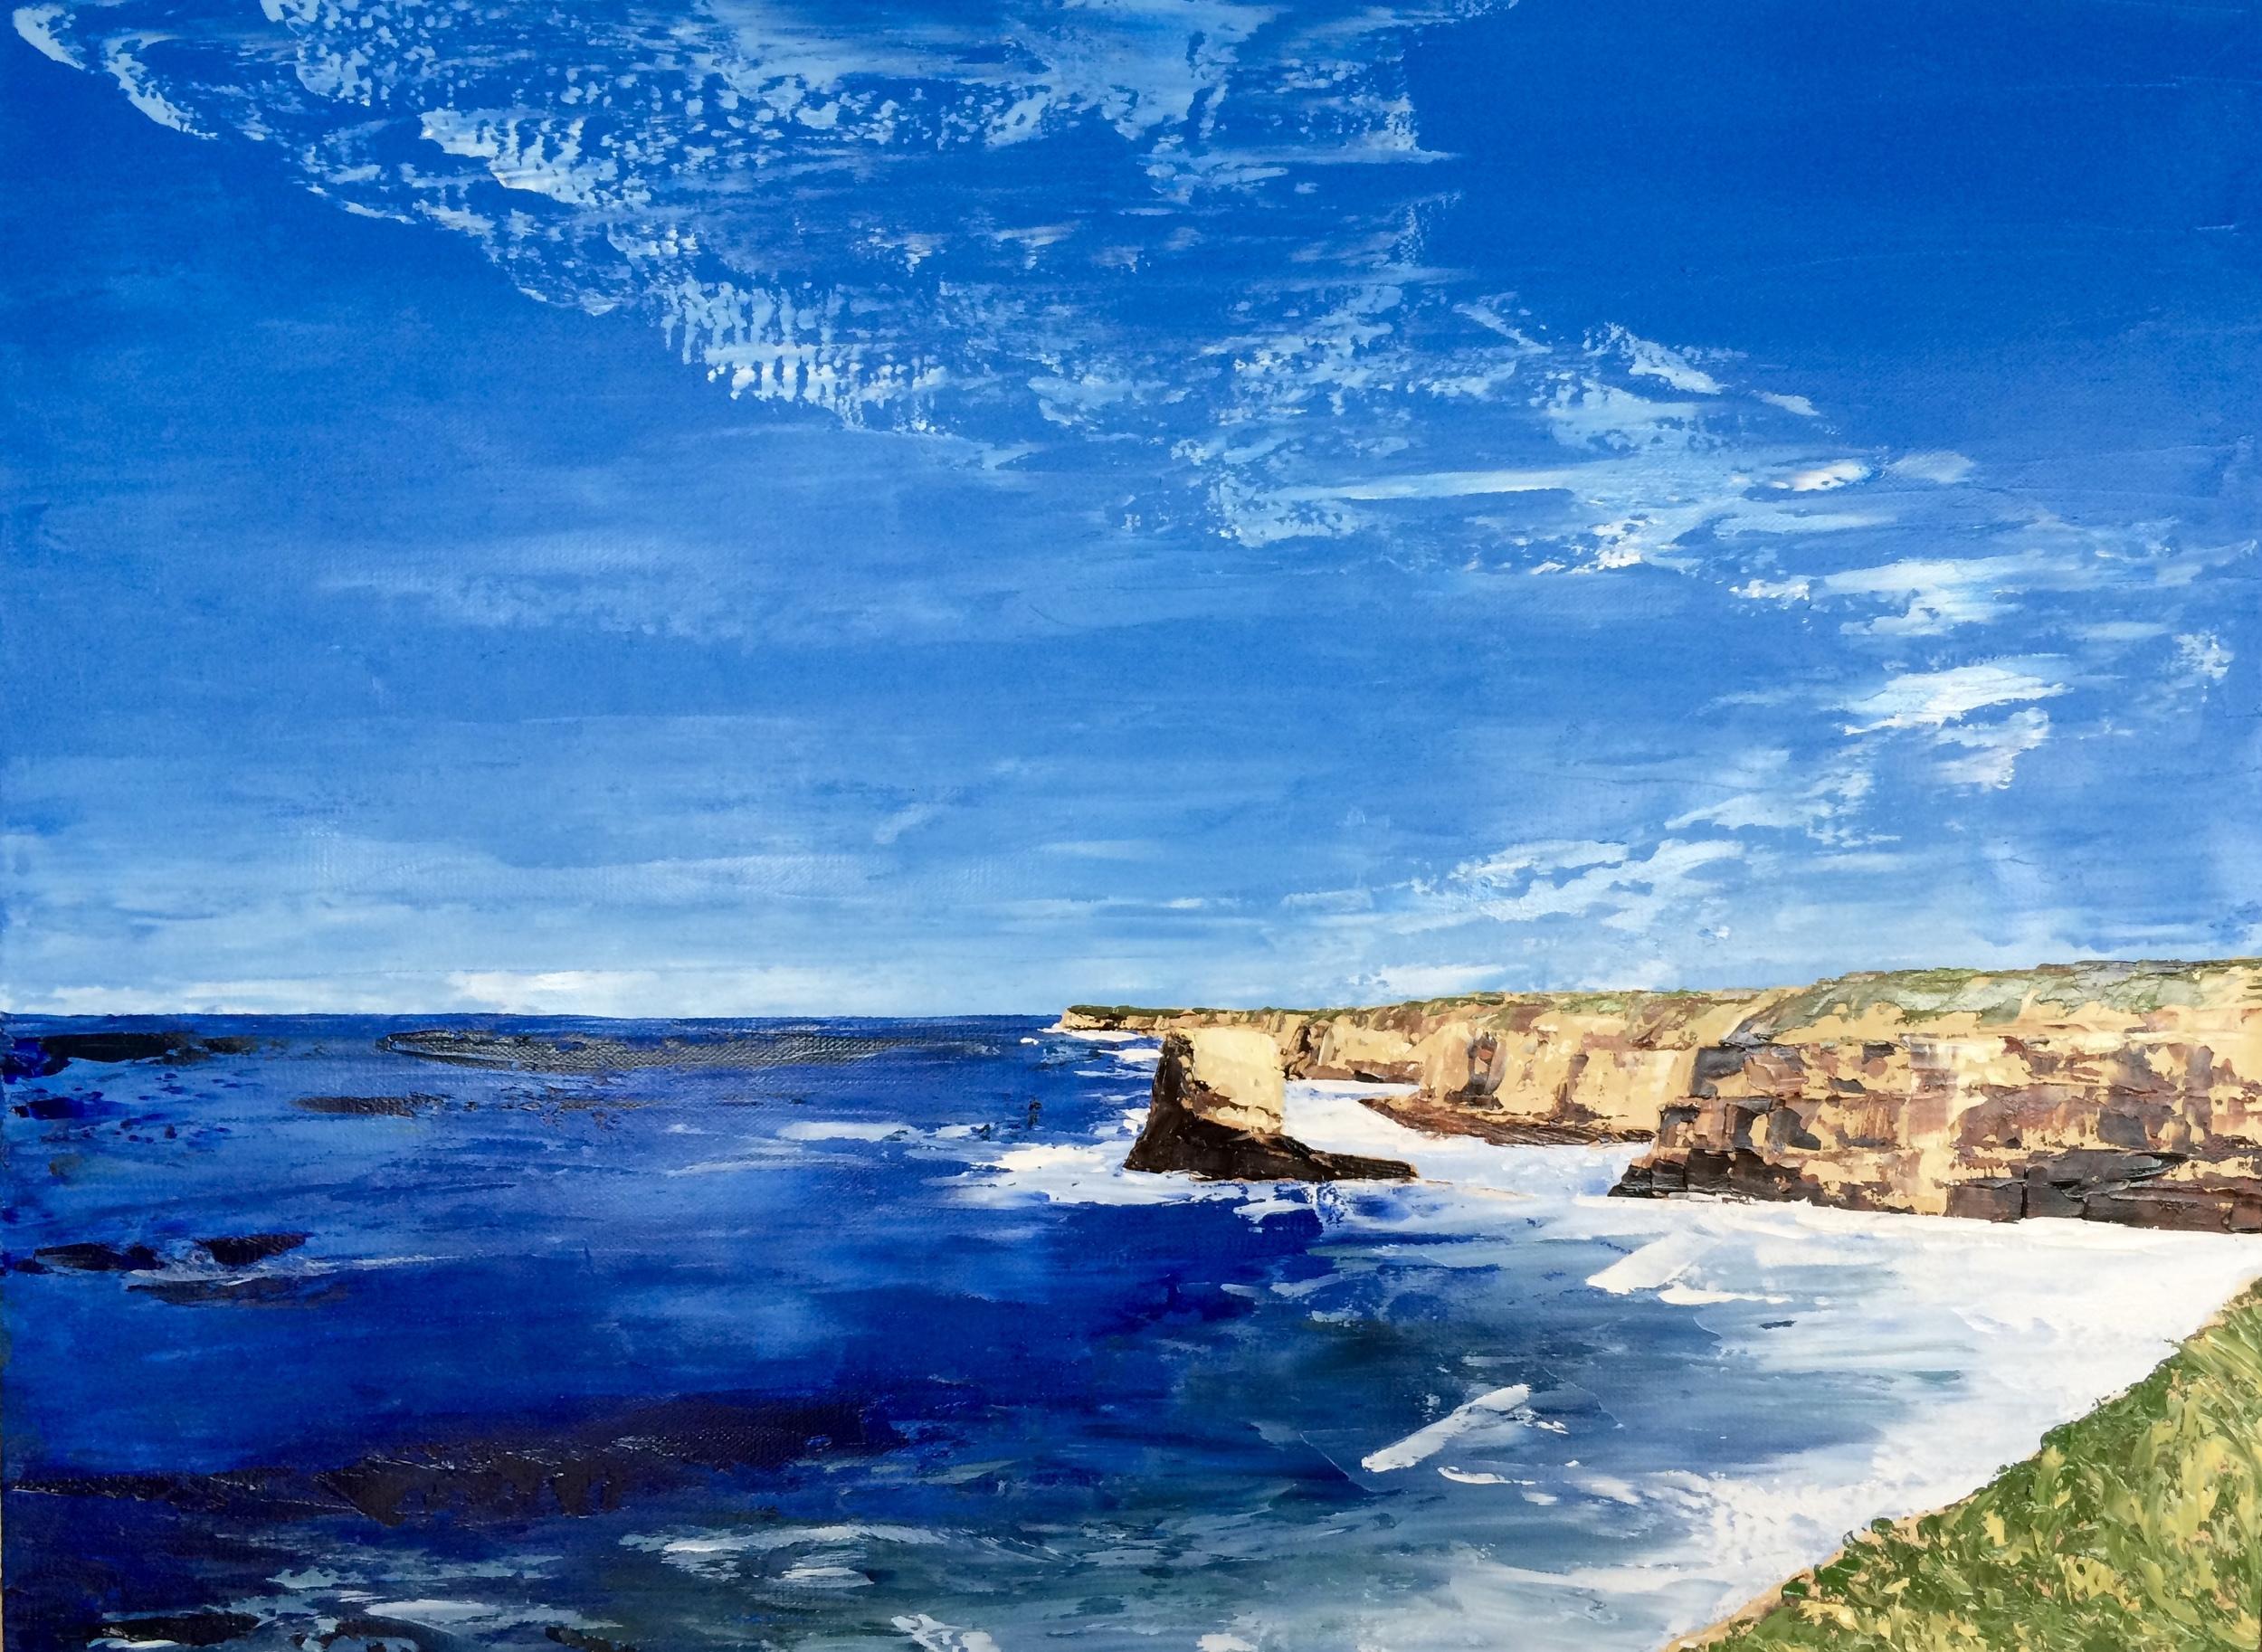 Wilder Ranch, 2016, oil on canvas (palette knife)